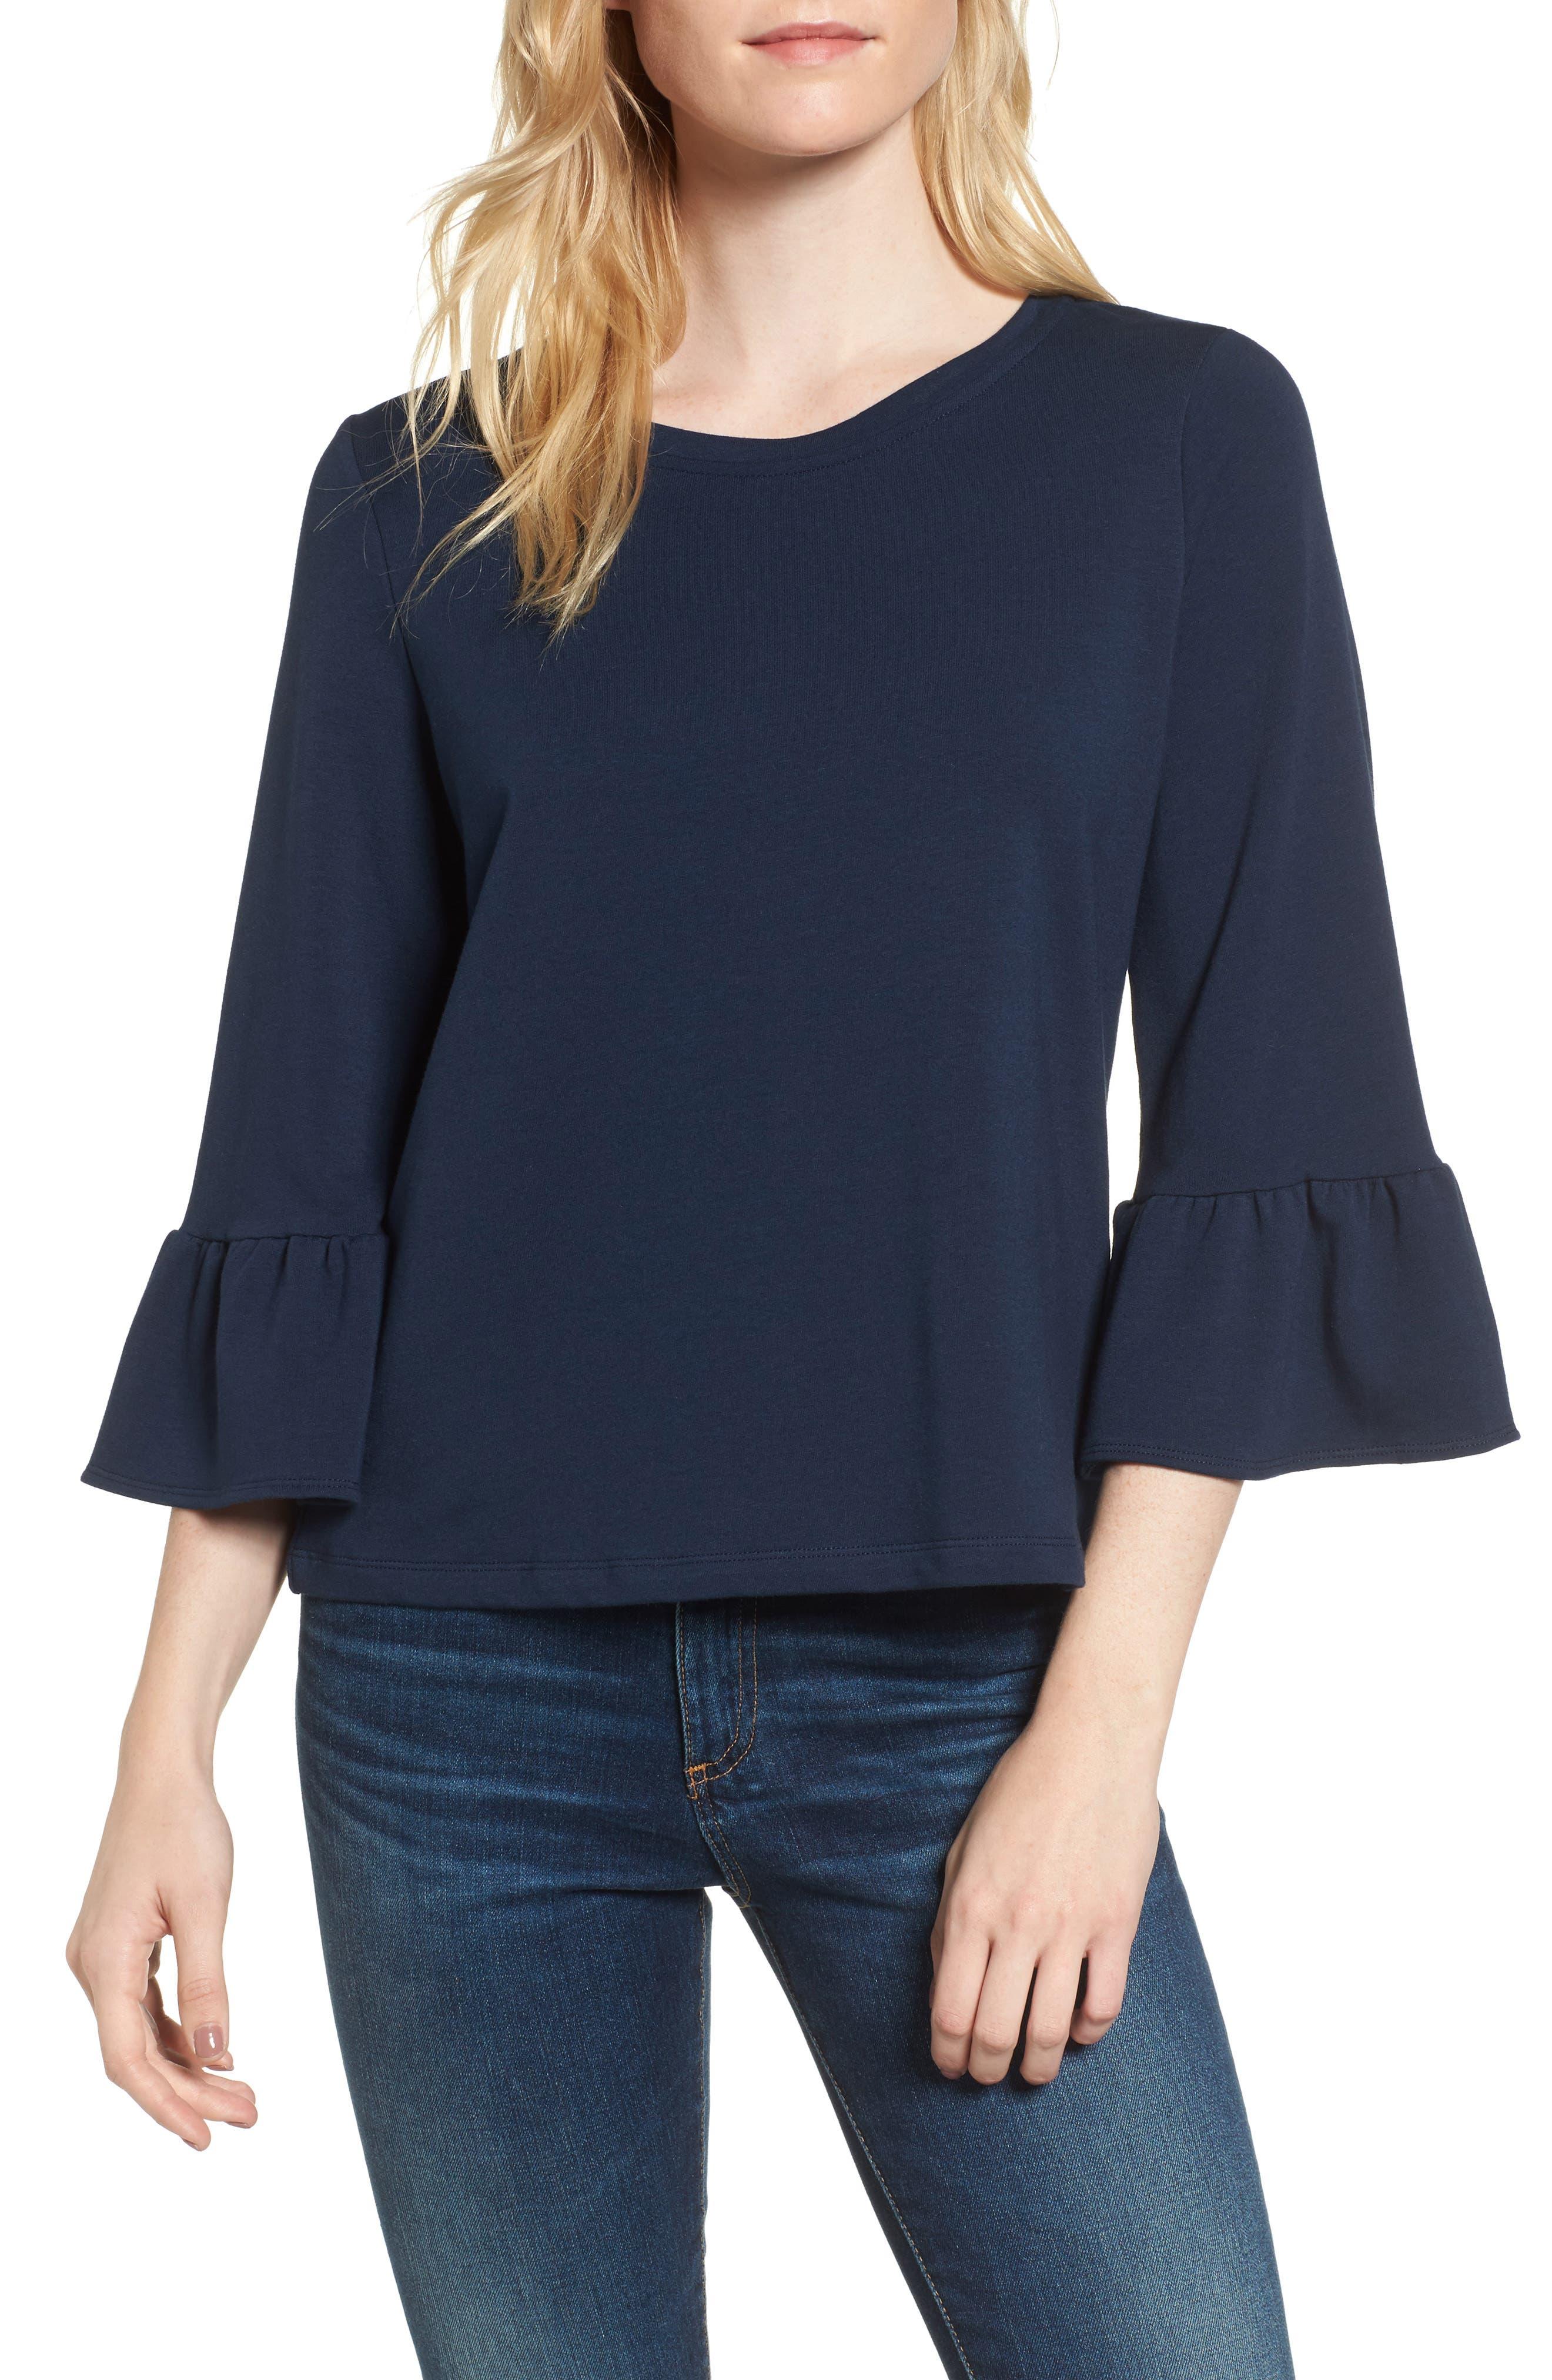 Main Image - Amour Vert Bernadette Bell Sleeve Sweatshirt